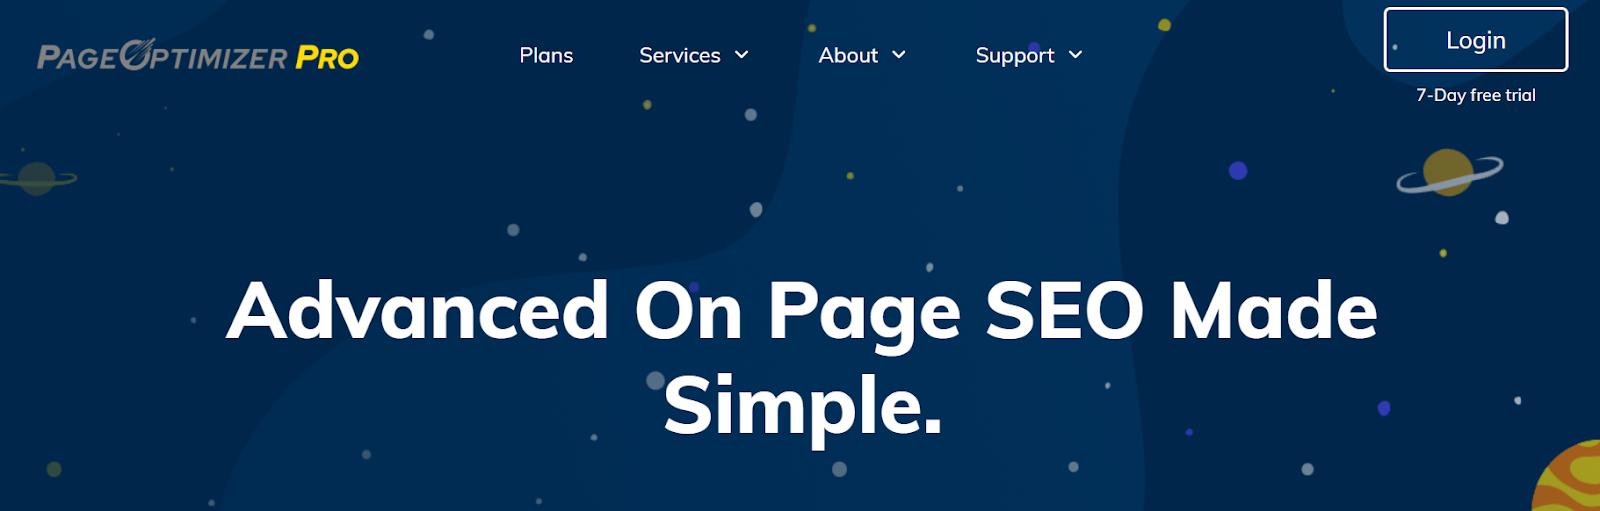 PageOptimizer Pro content optimization tool